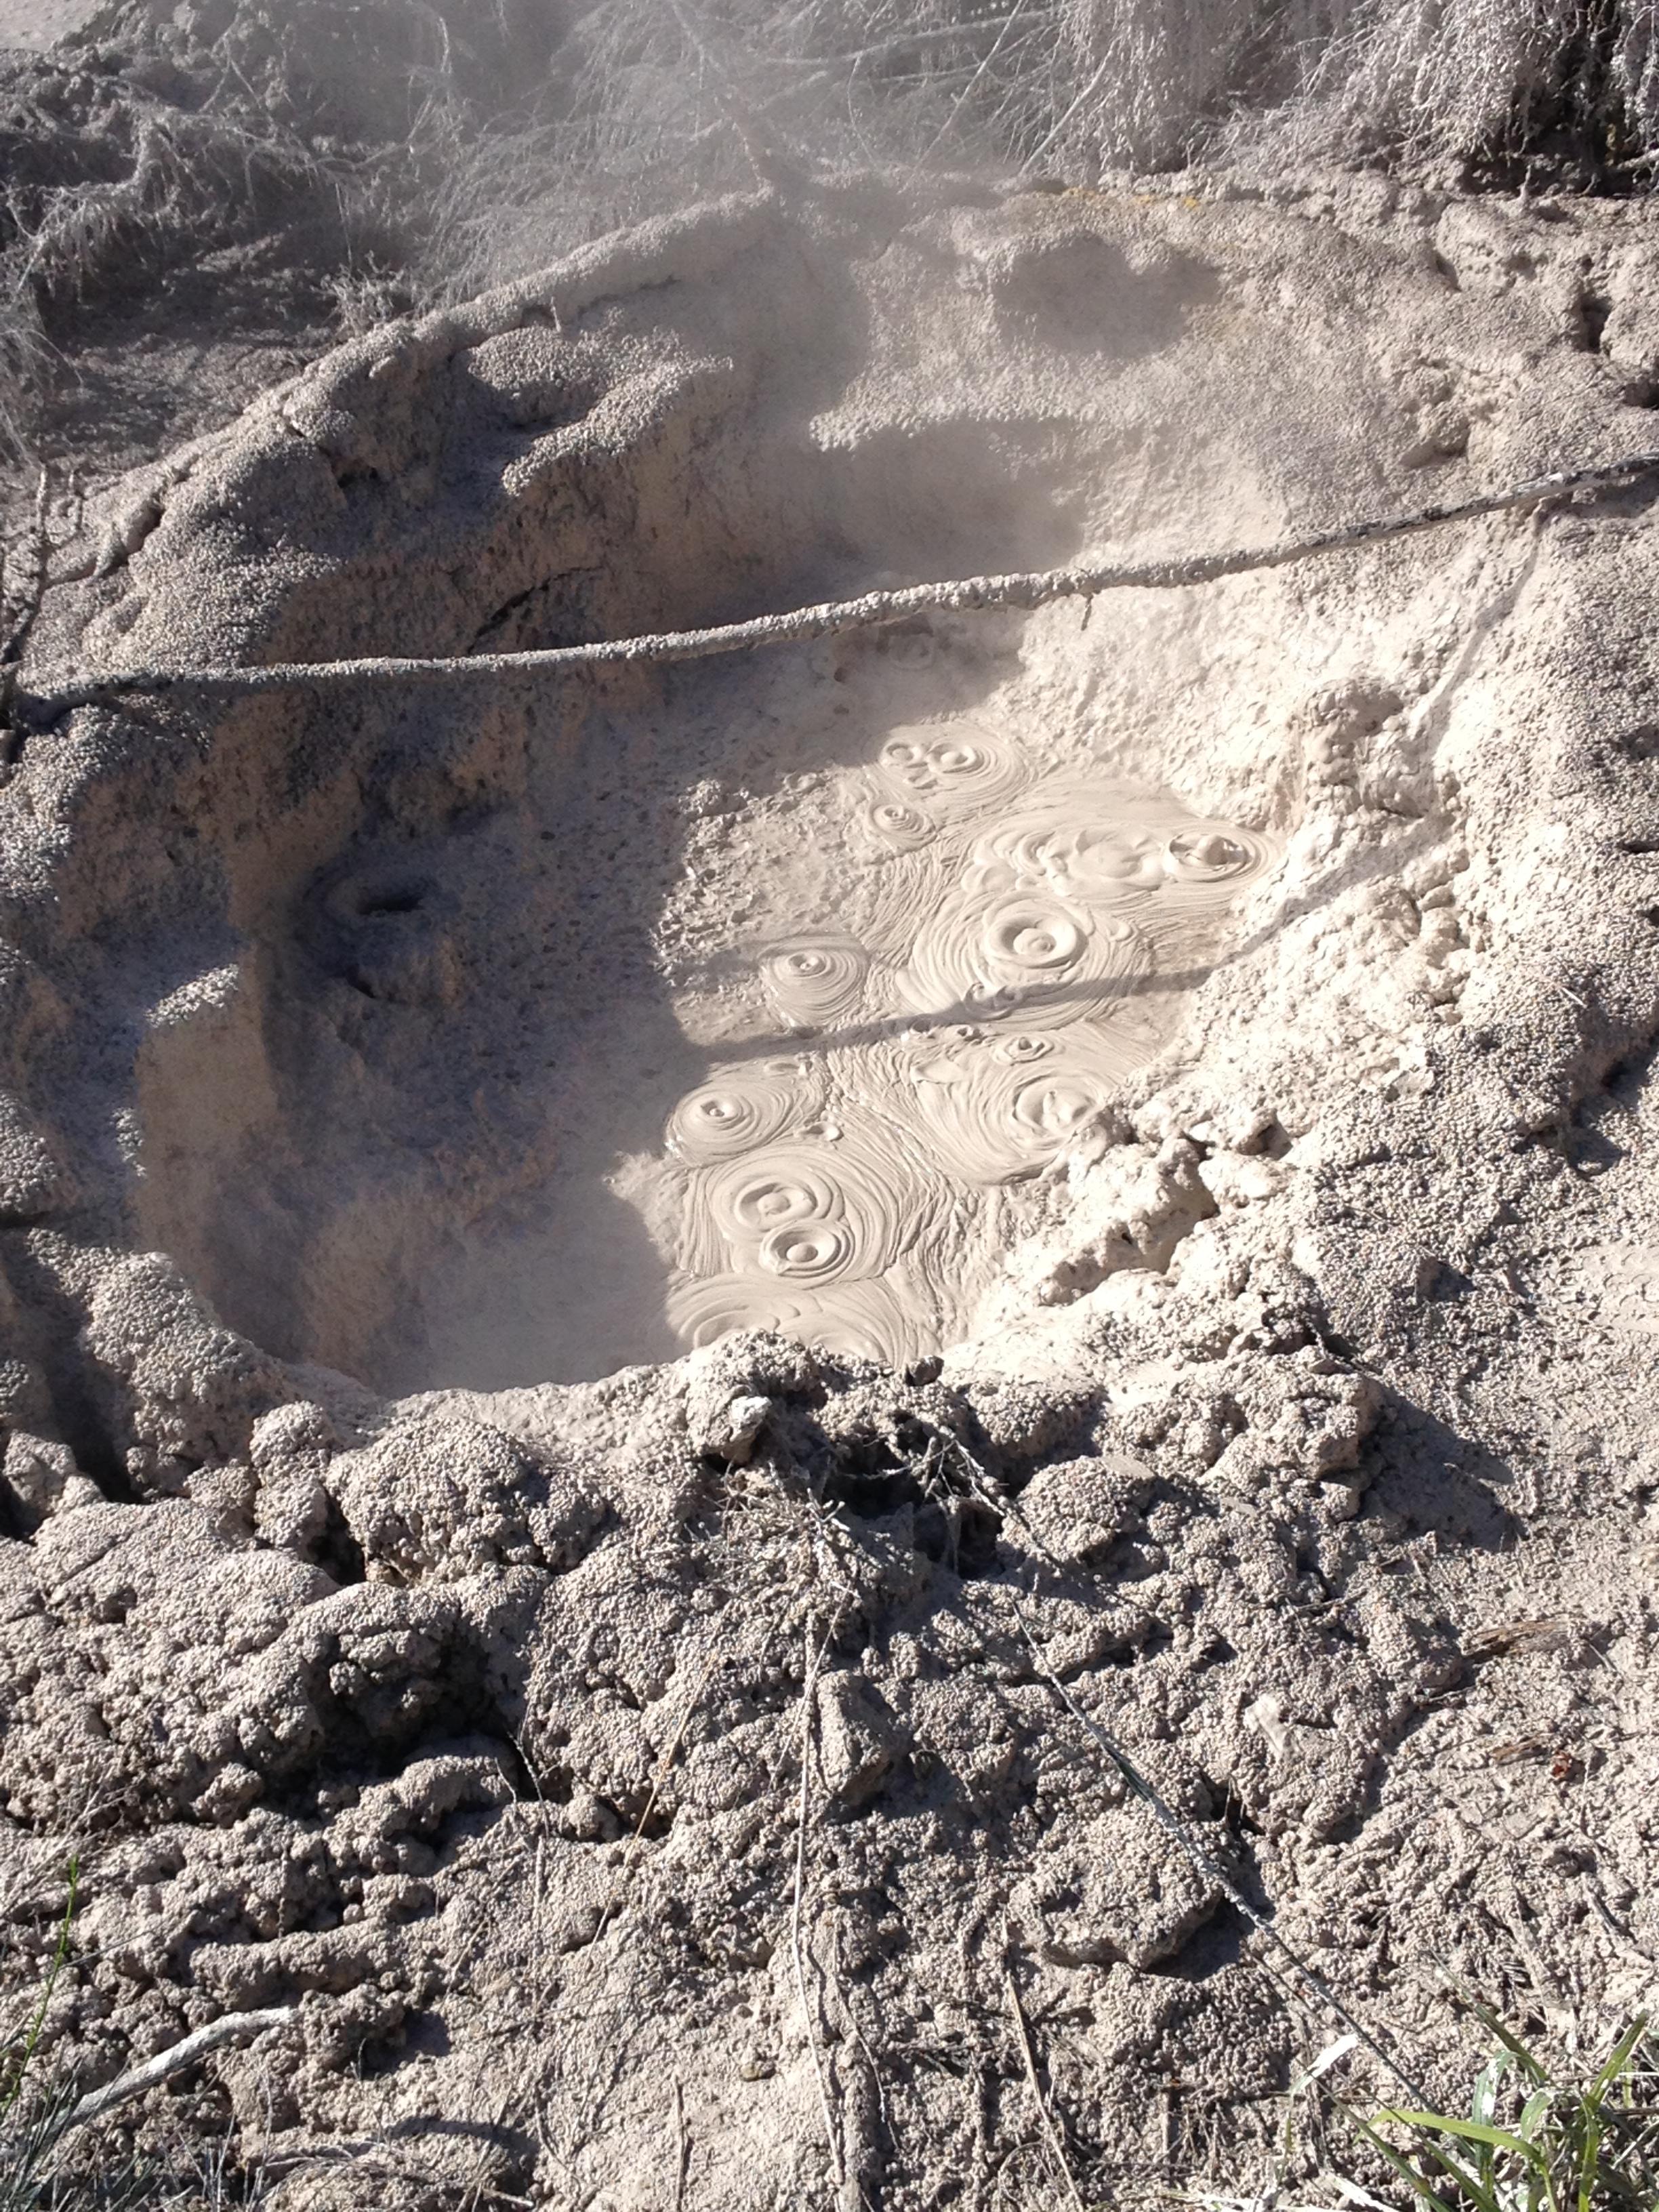 Bubbling mud pools